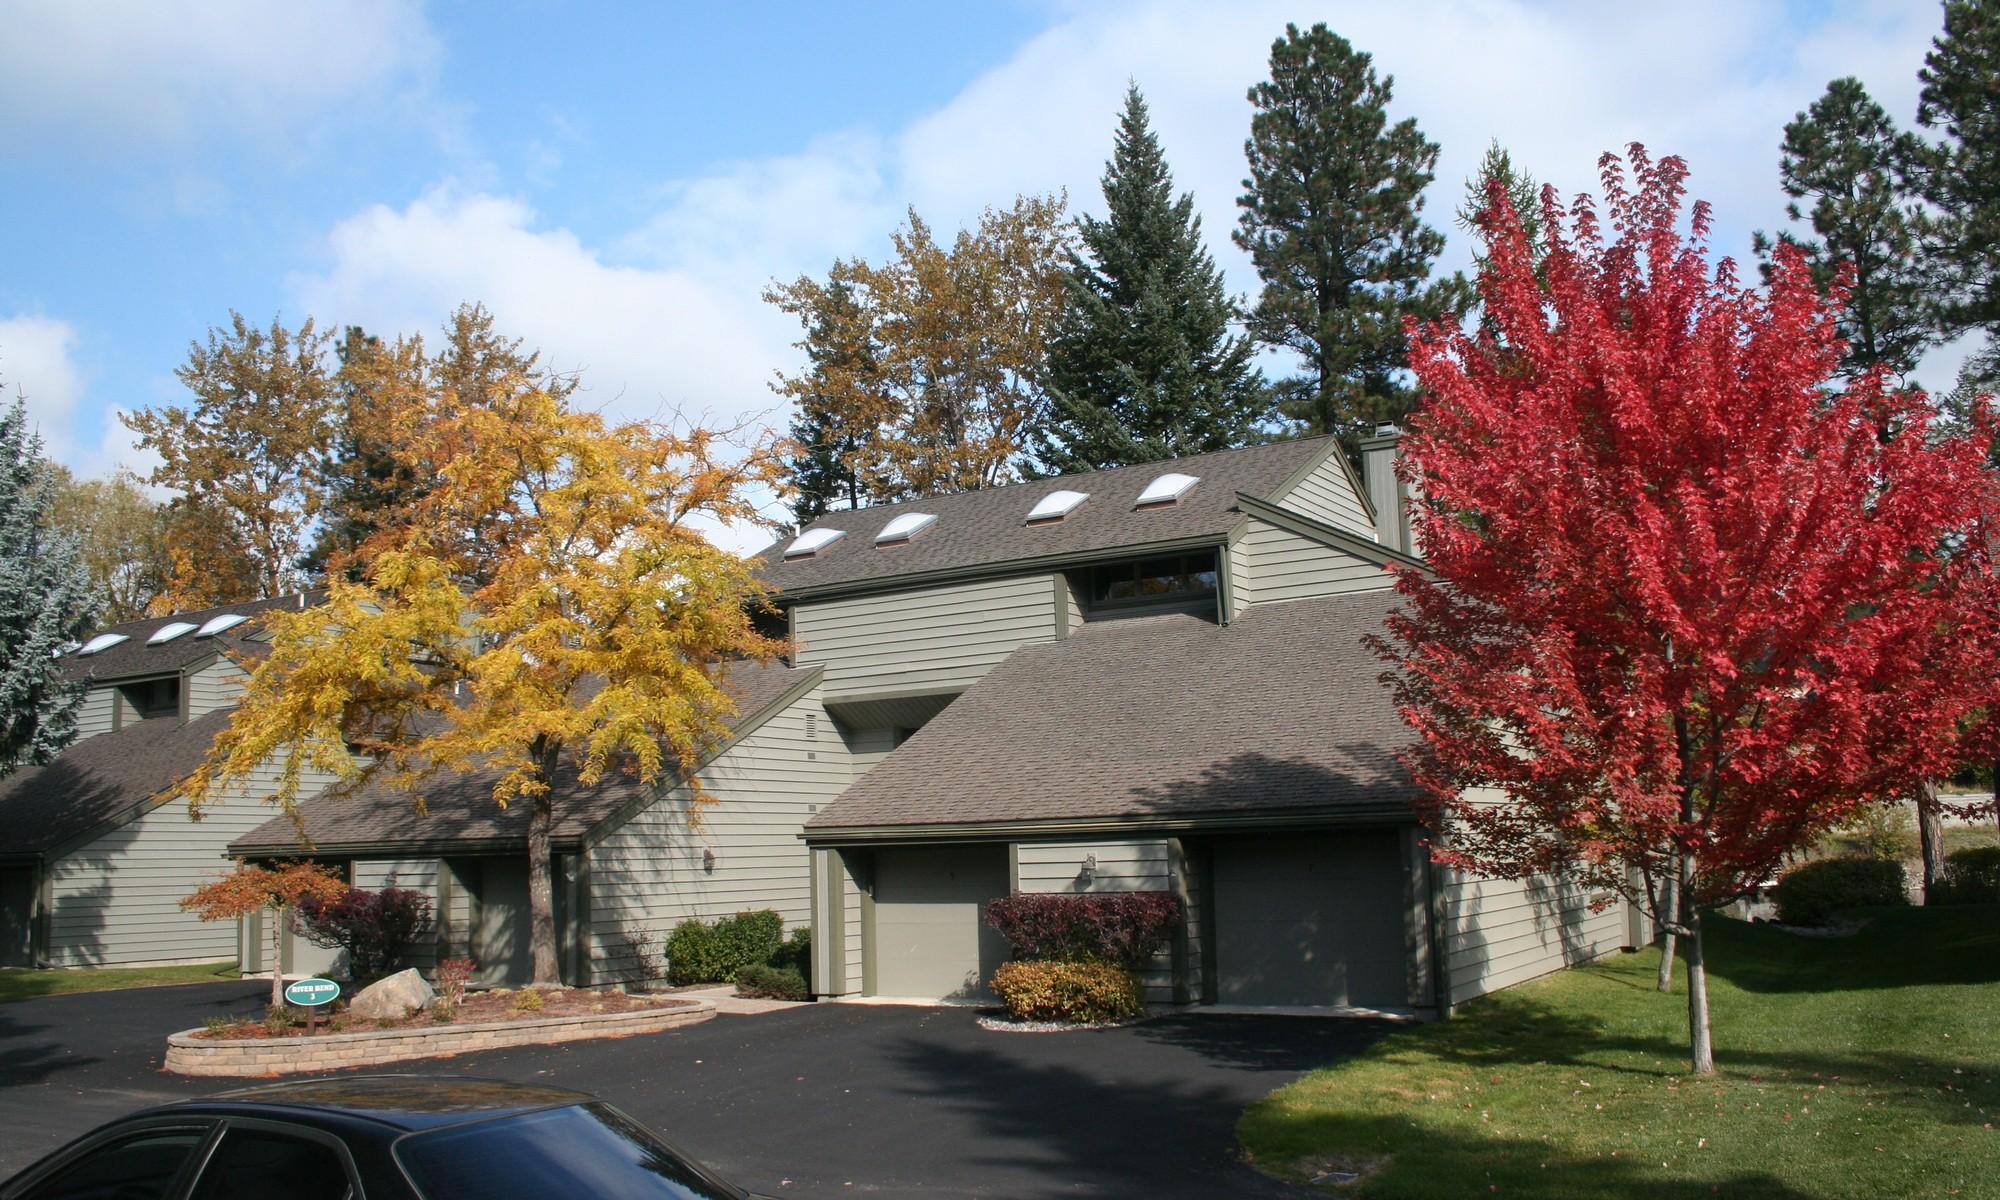 Condominium for Sale at Bigfork Bay Views 270 Bridge Street Building 3 Unit 3 Bigfork, Montana 59911 United States